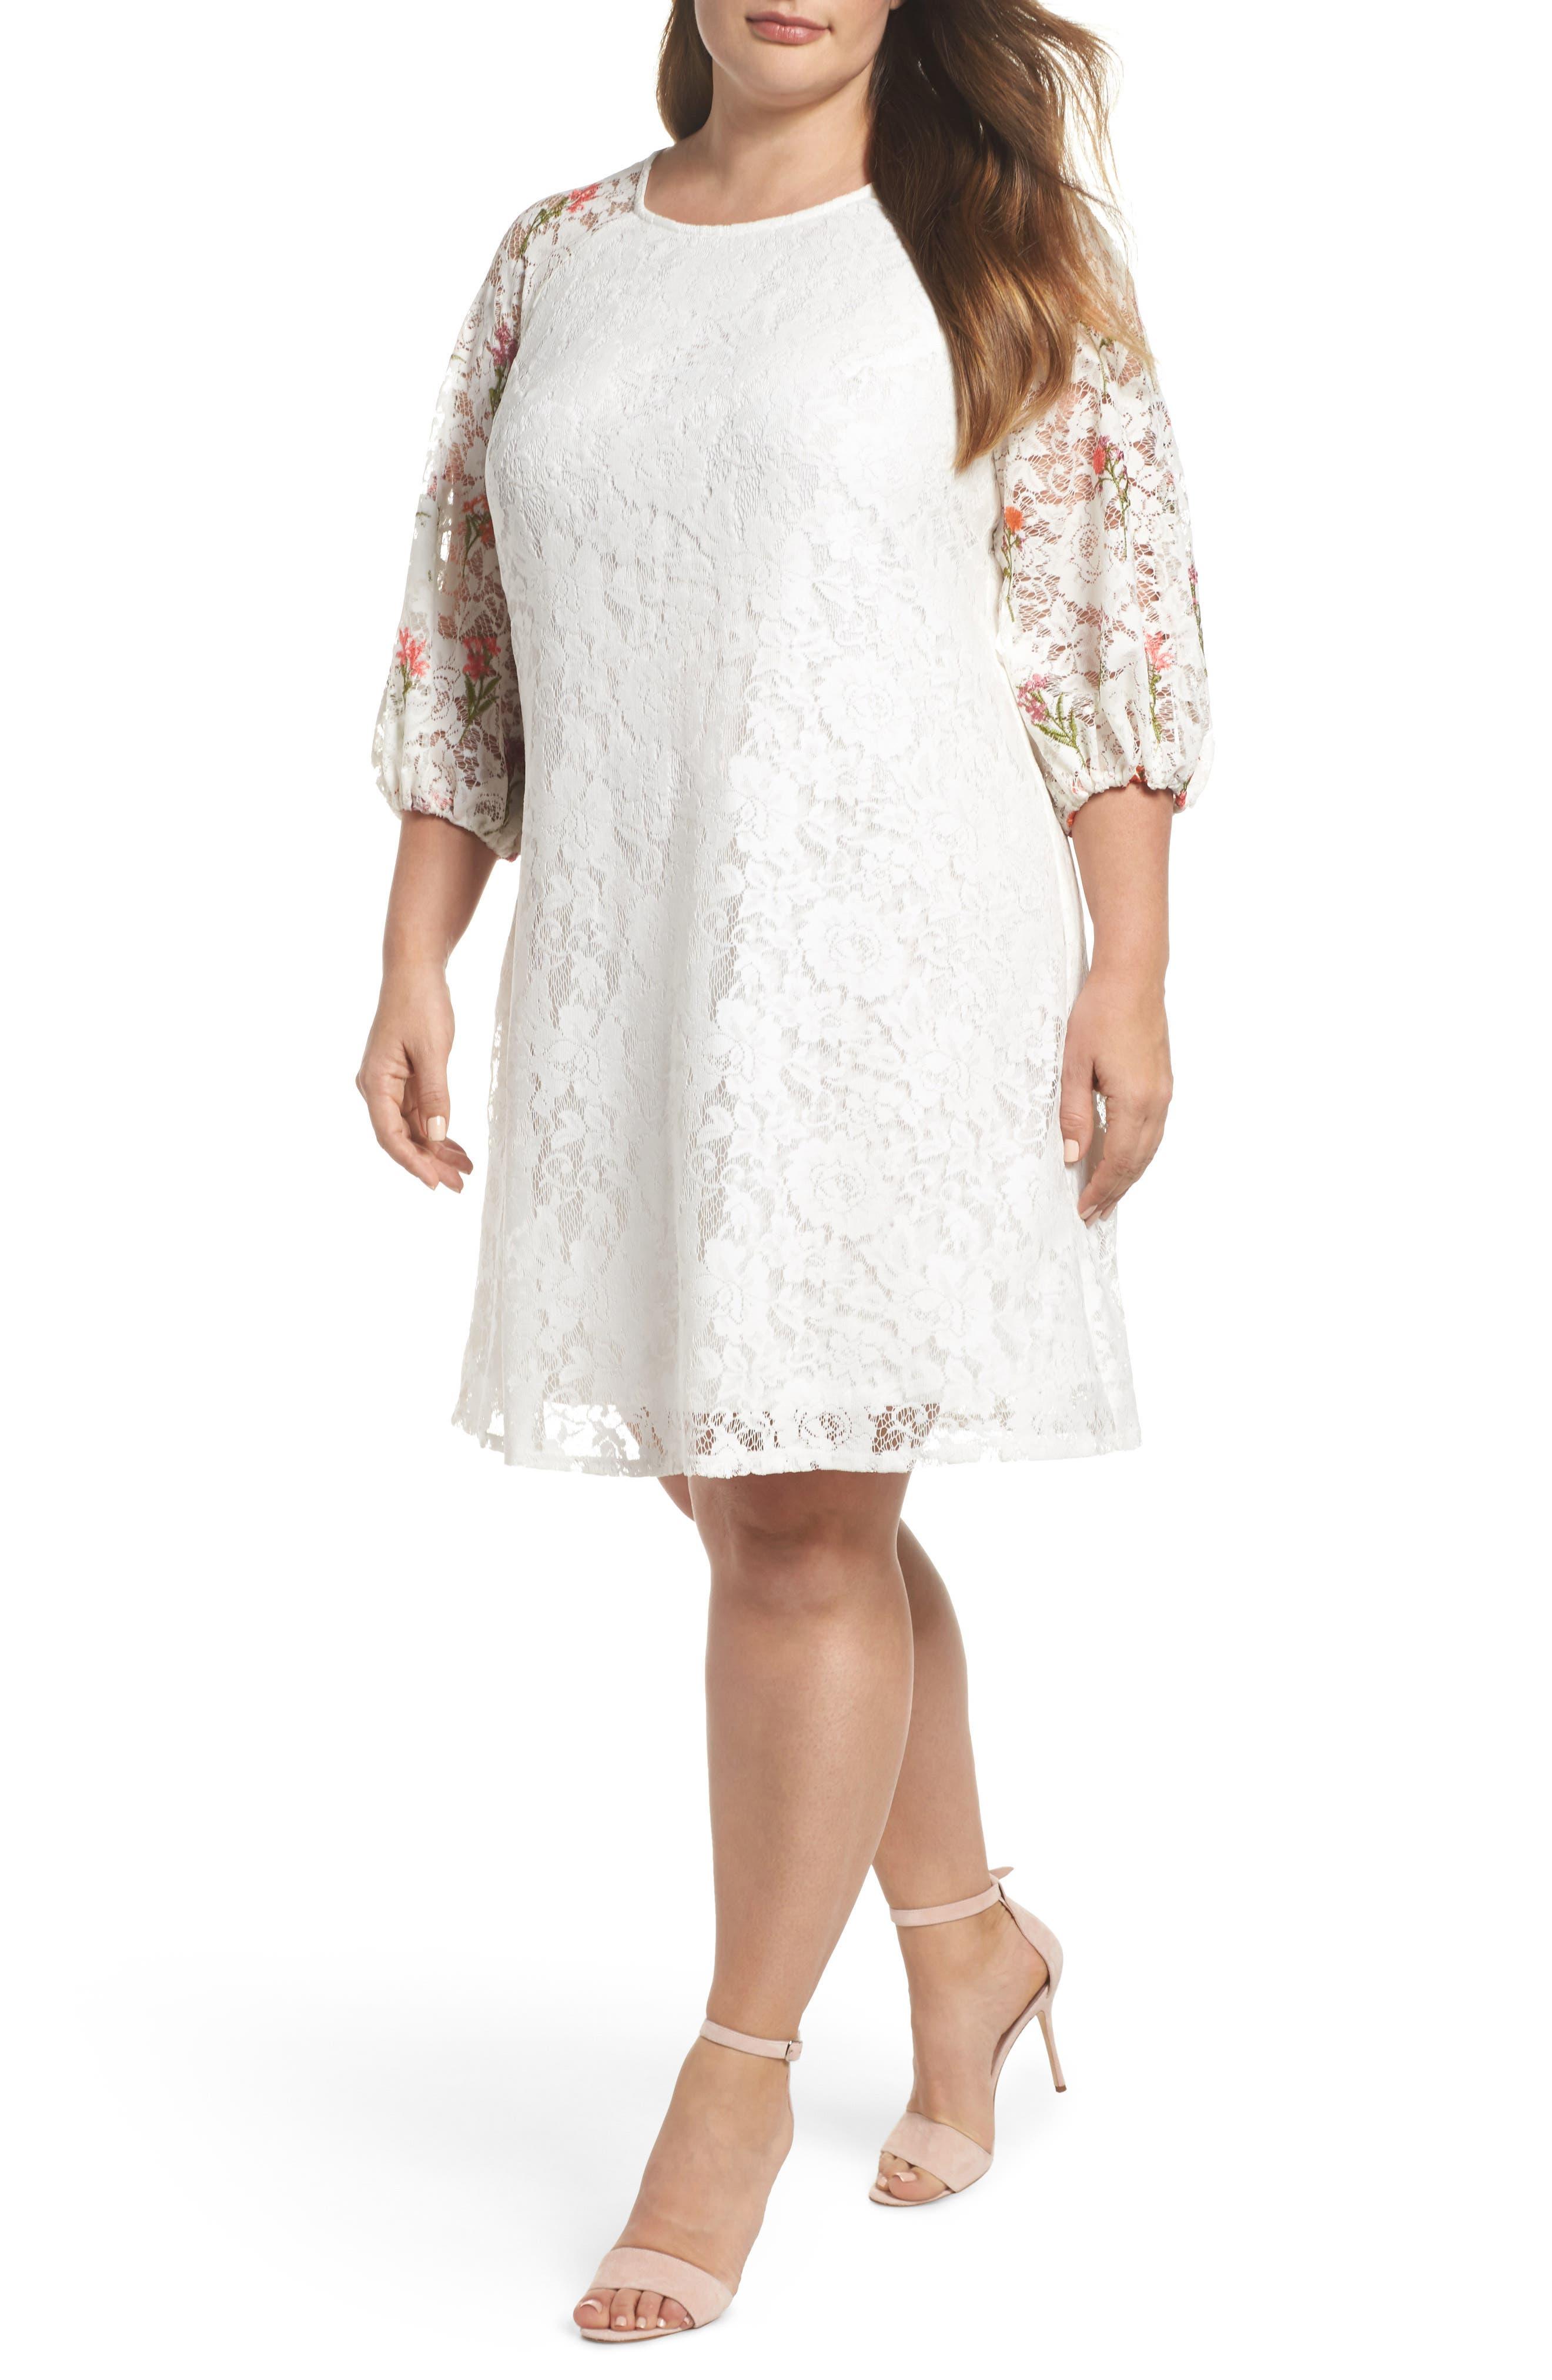 Gabby Skye Lace Embroidered Trapeze Dress (Plus Size)